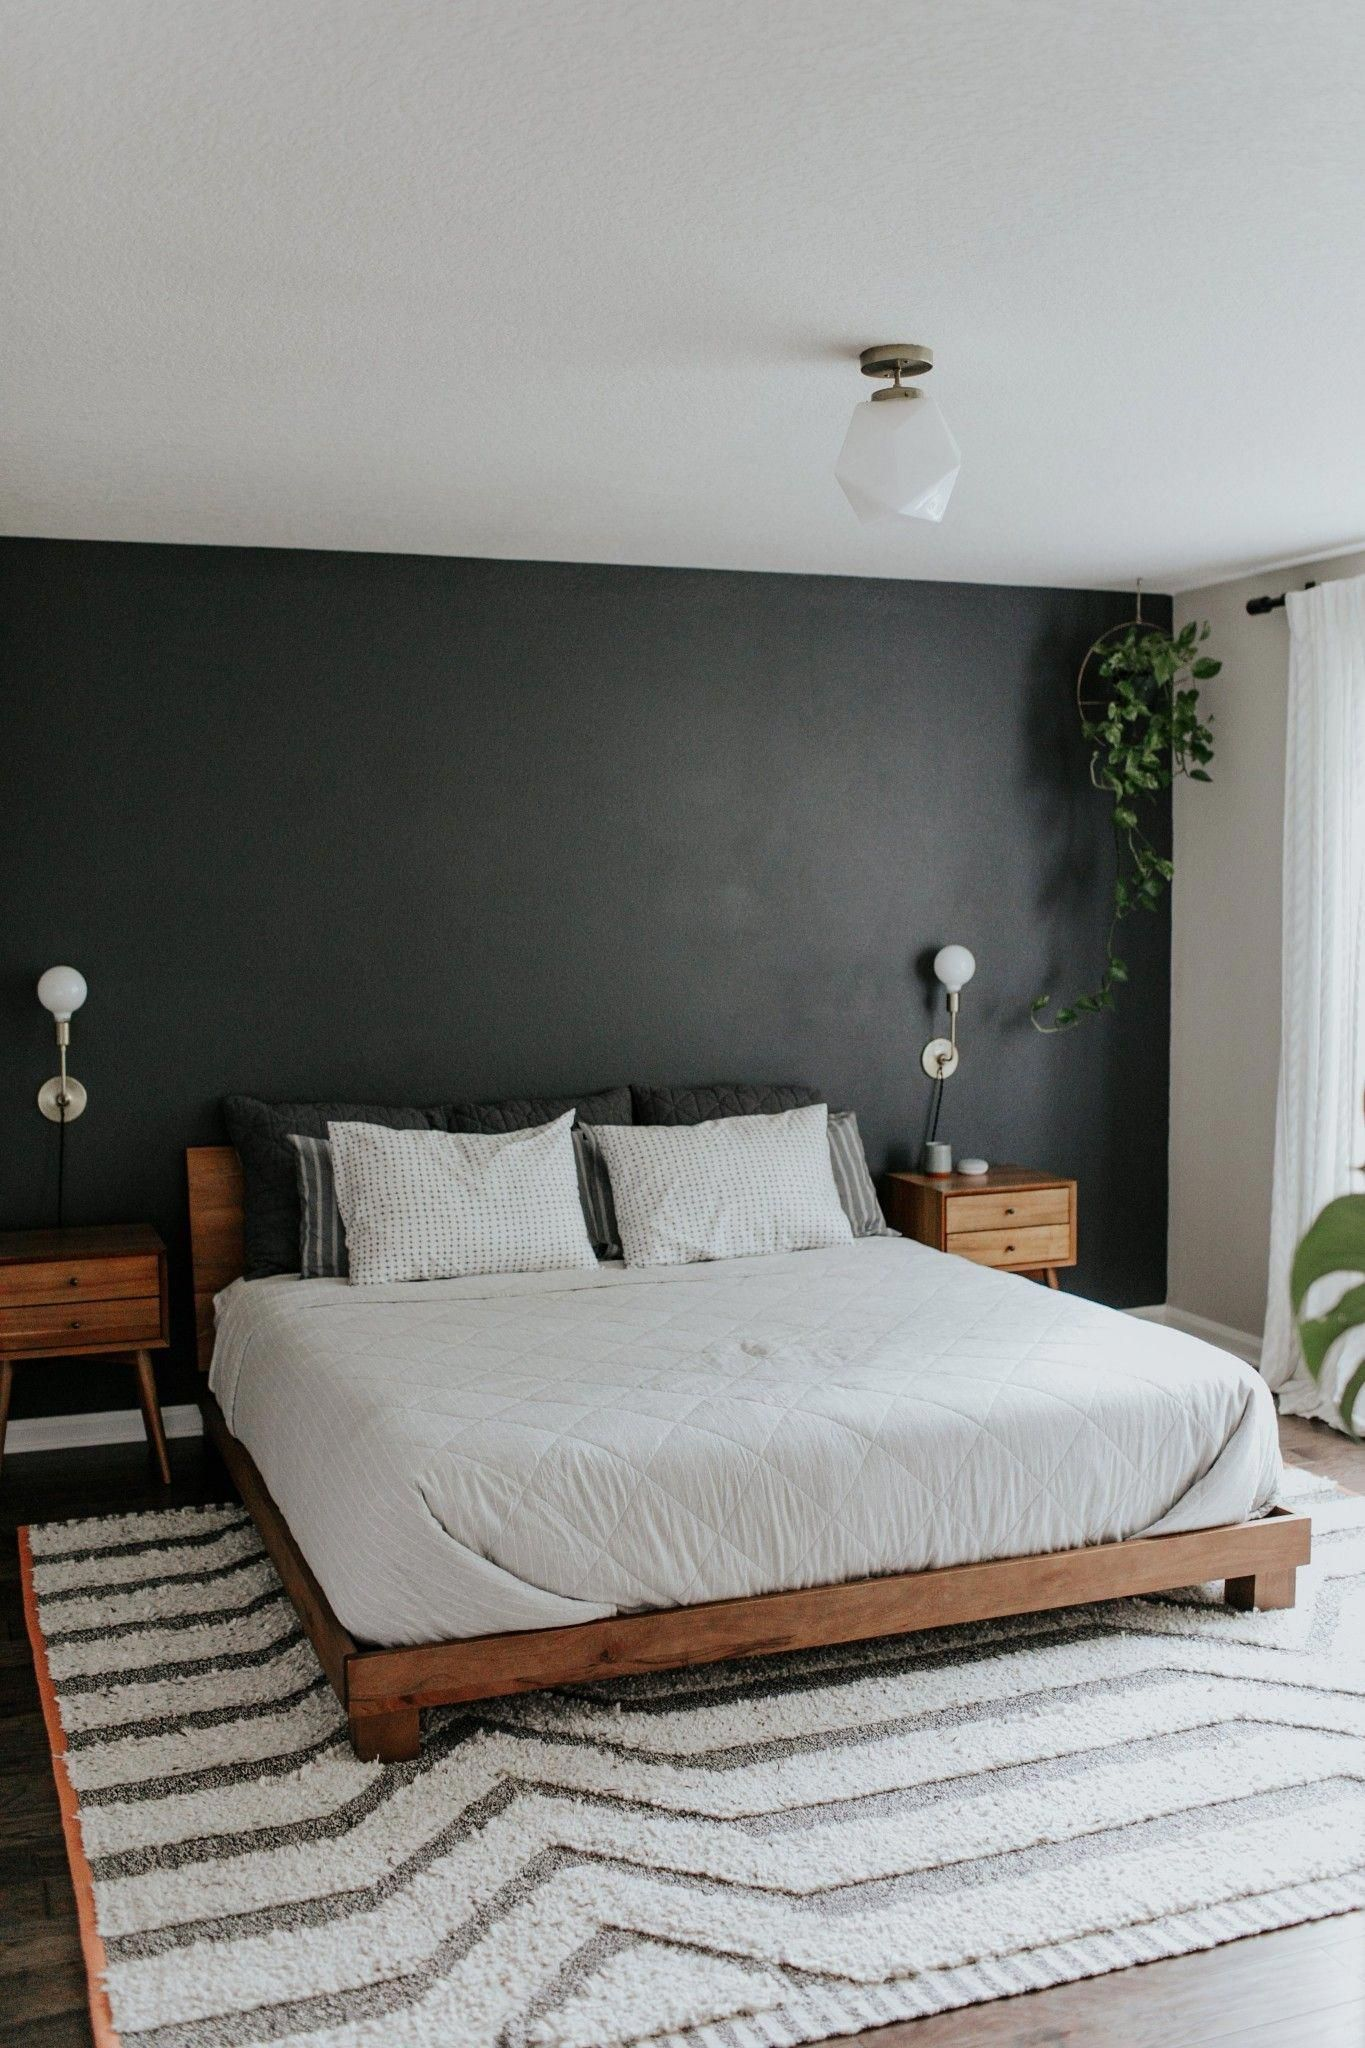 Black Accent Wall Wood Mid Century Modern Nightstands Platform Bed White Bedding Homedecorhowto Bedroom Interior Bedroom Inspirations Bedroom Design